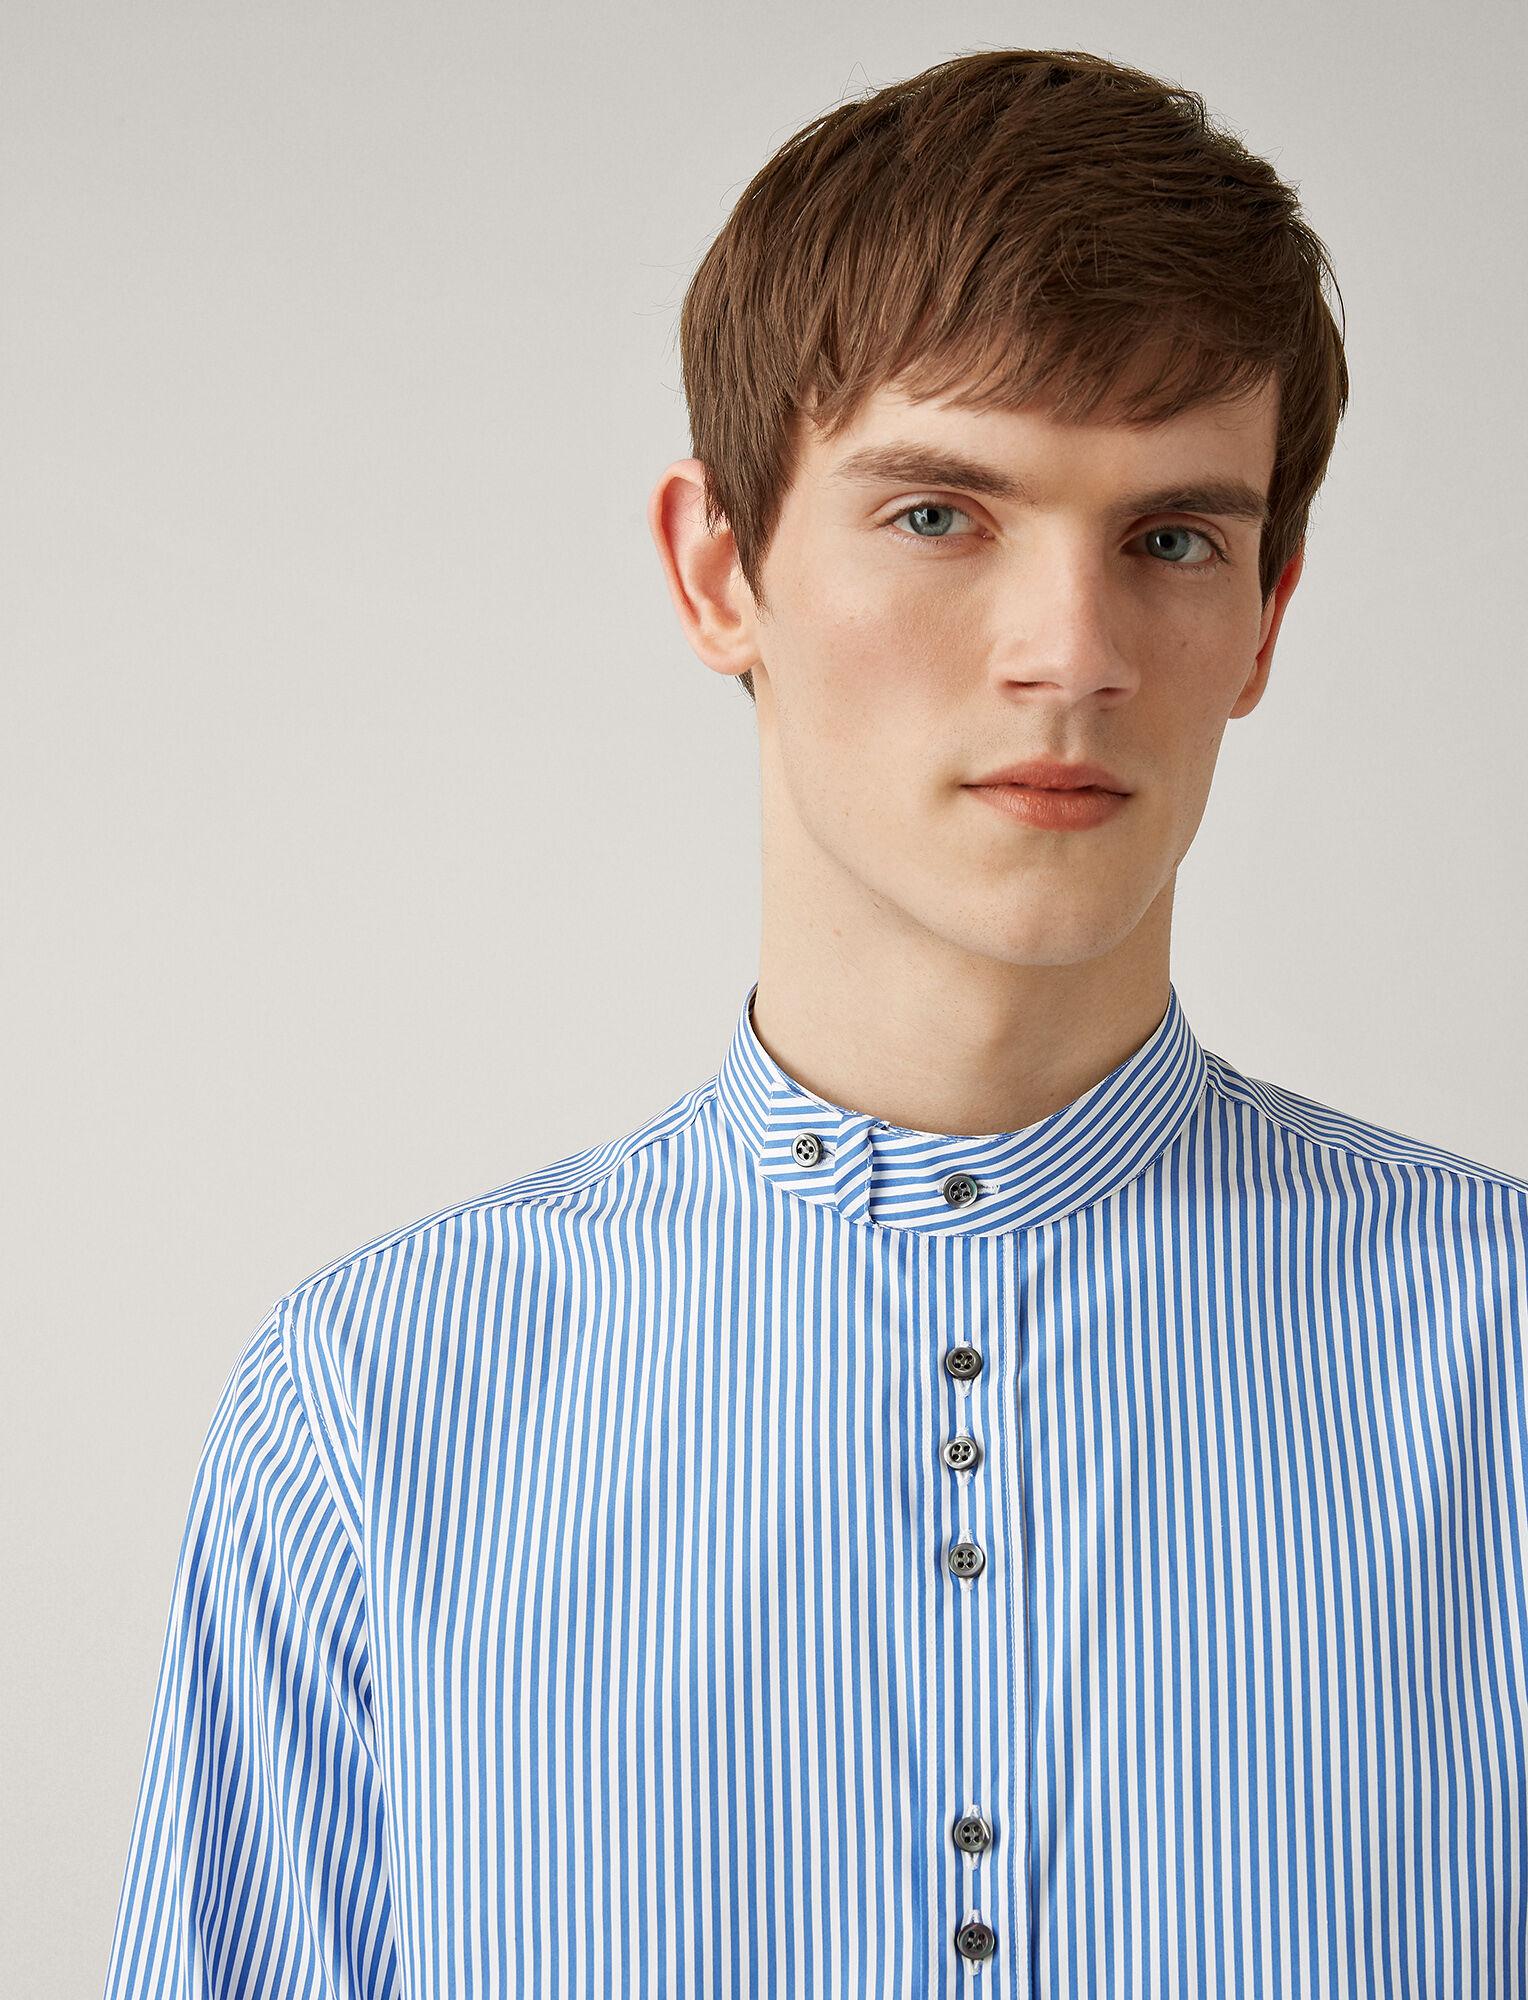 Joseph, Jarvis Cupro Pinstripes Mix Shirts, in